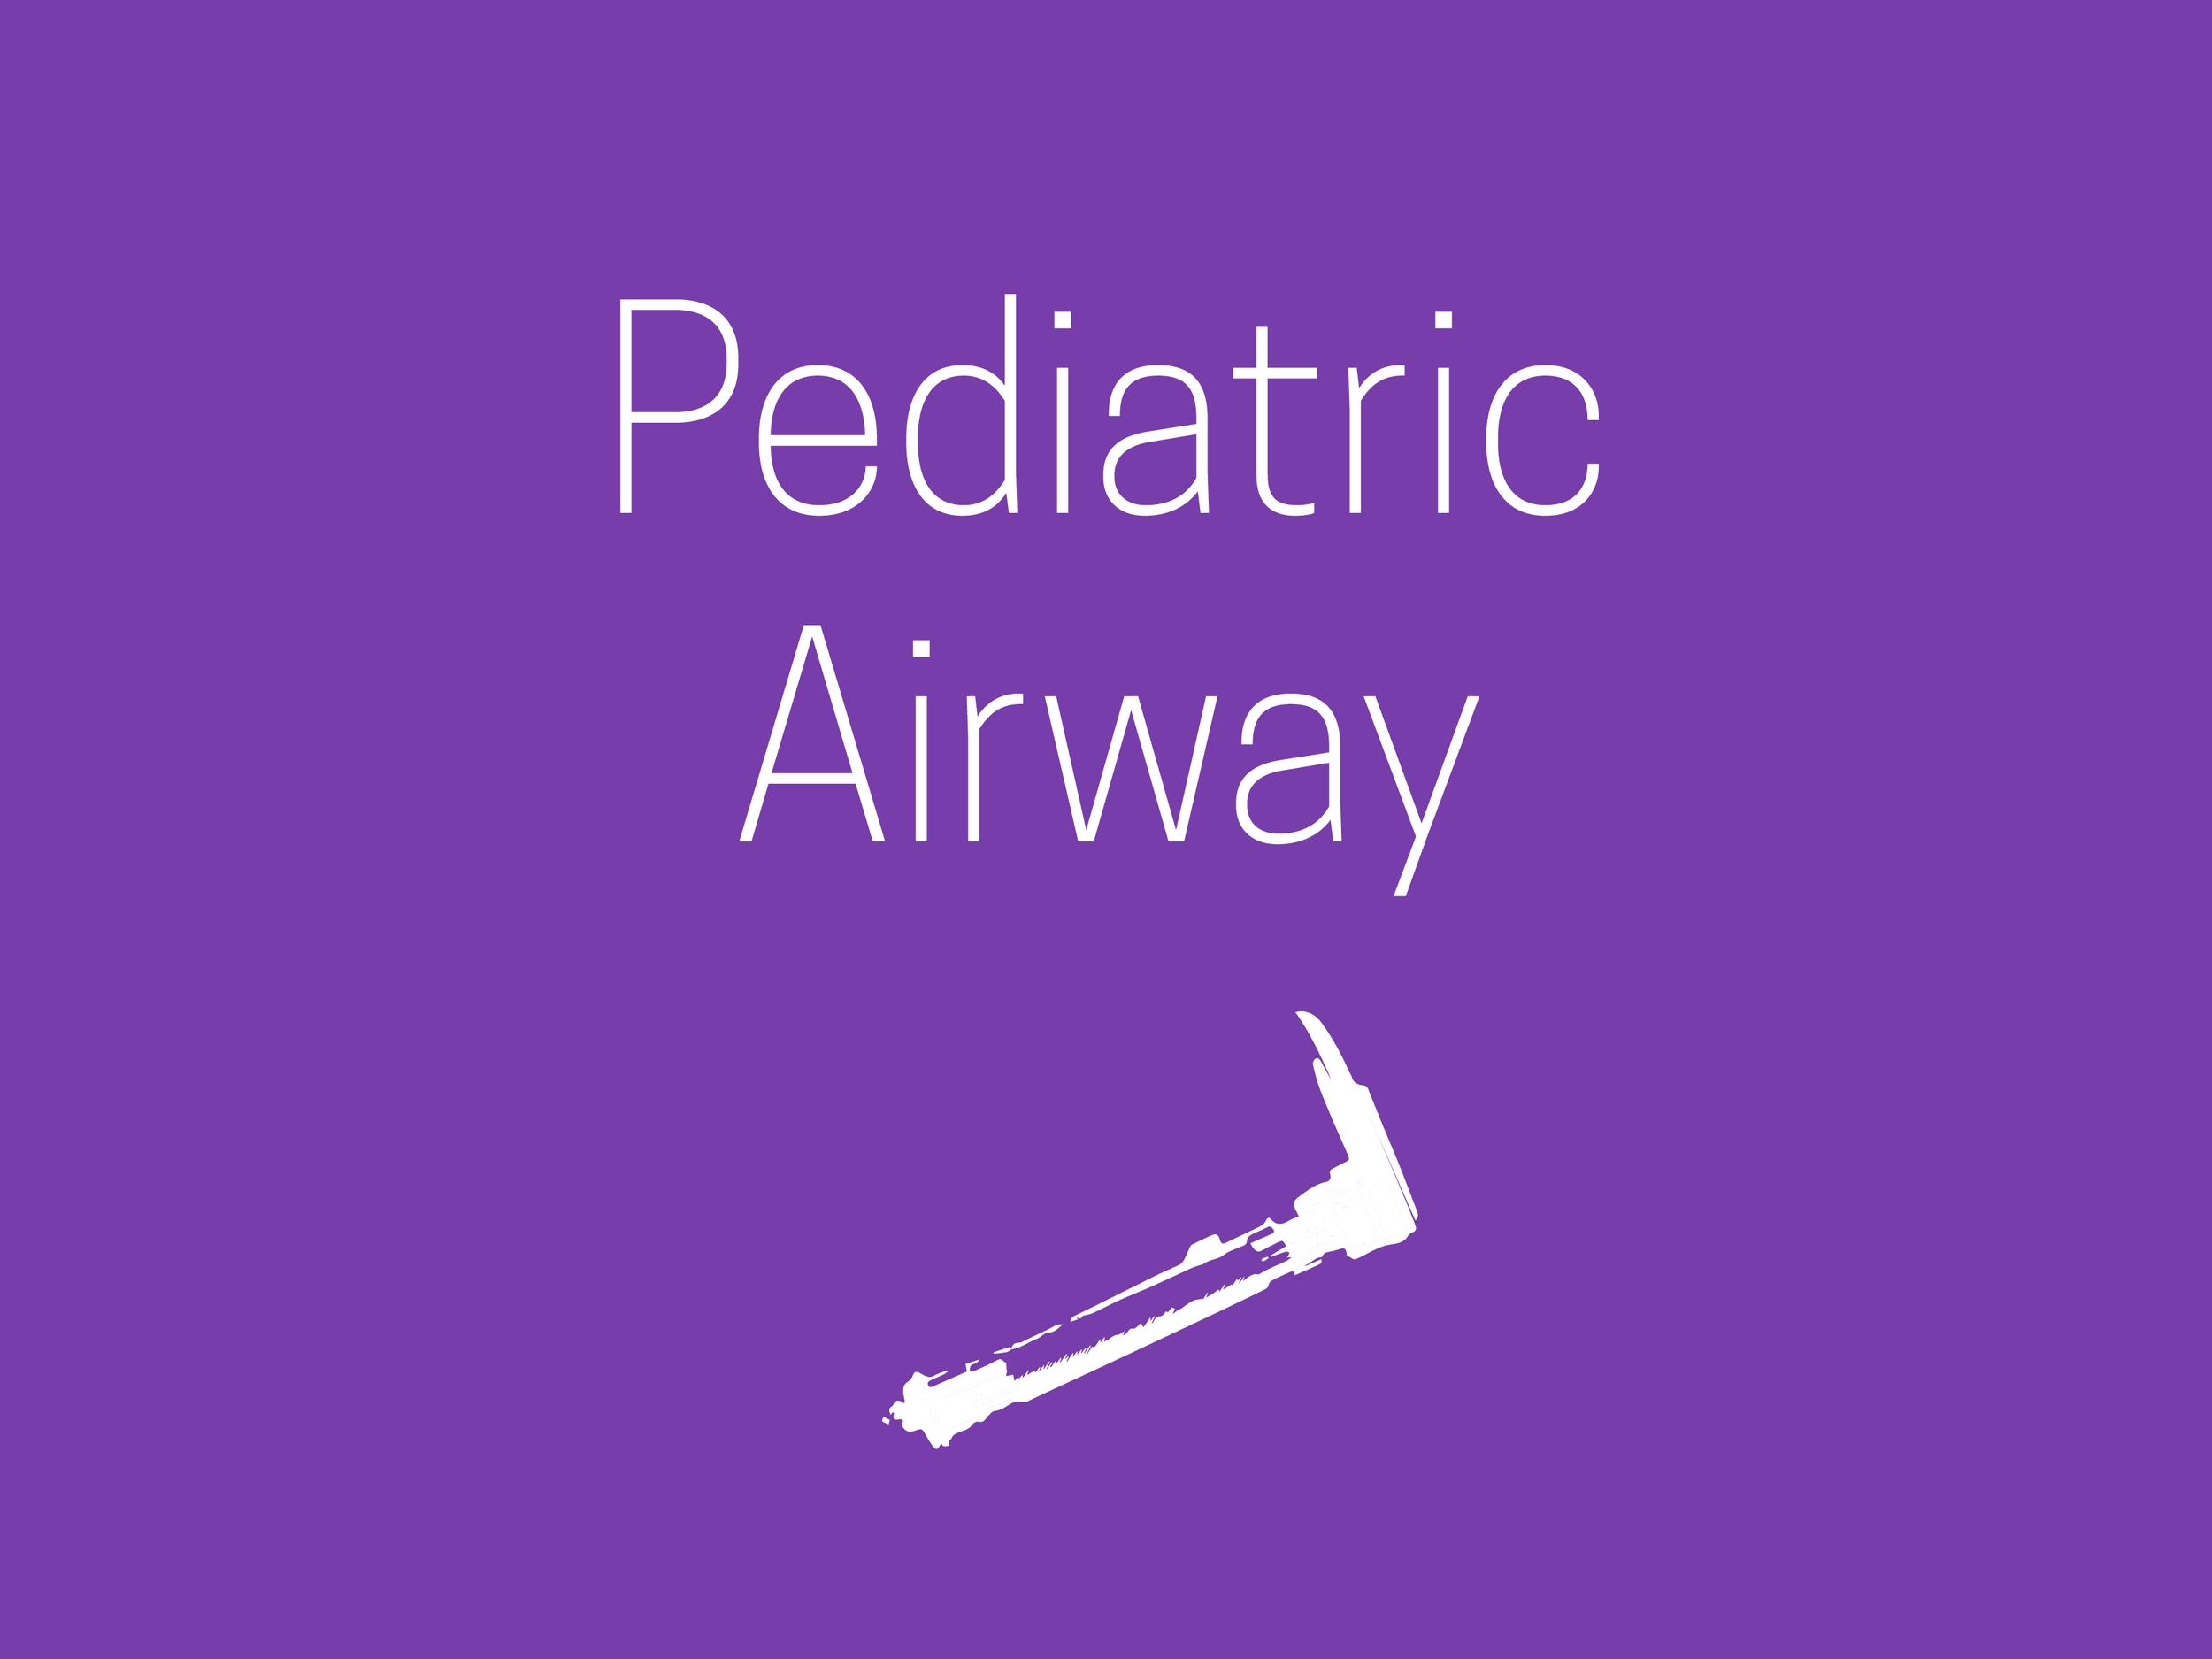 AirwayLit_CategoryArt-06.png